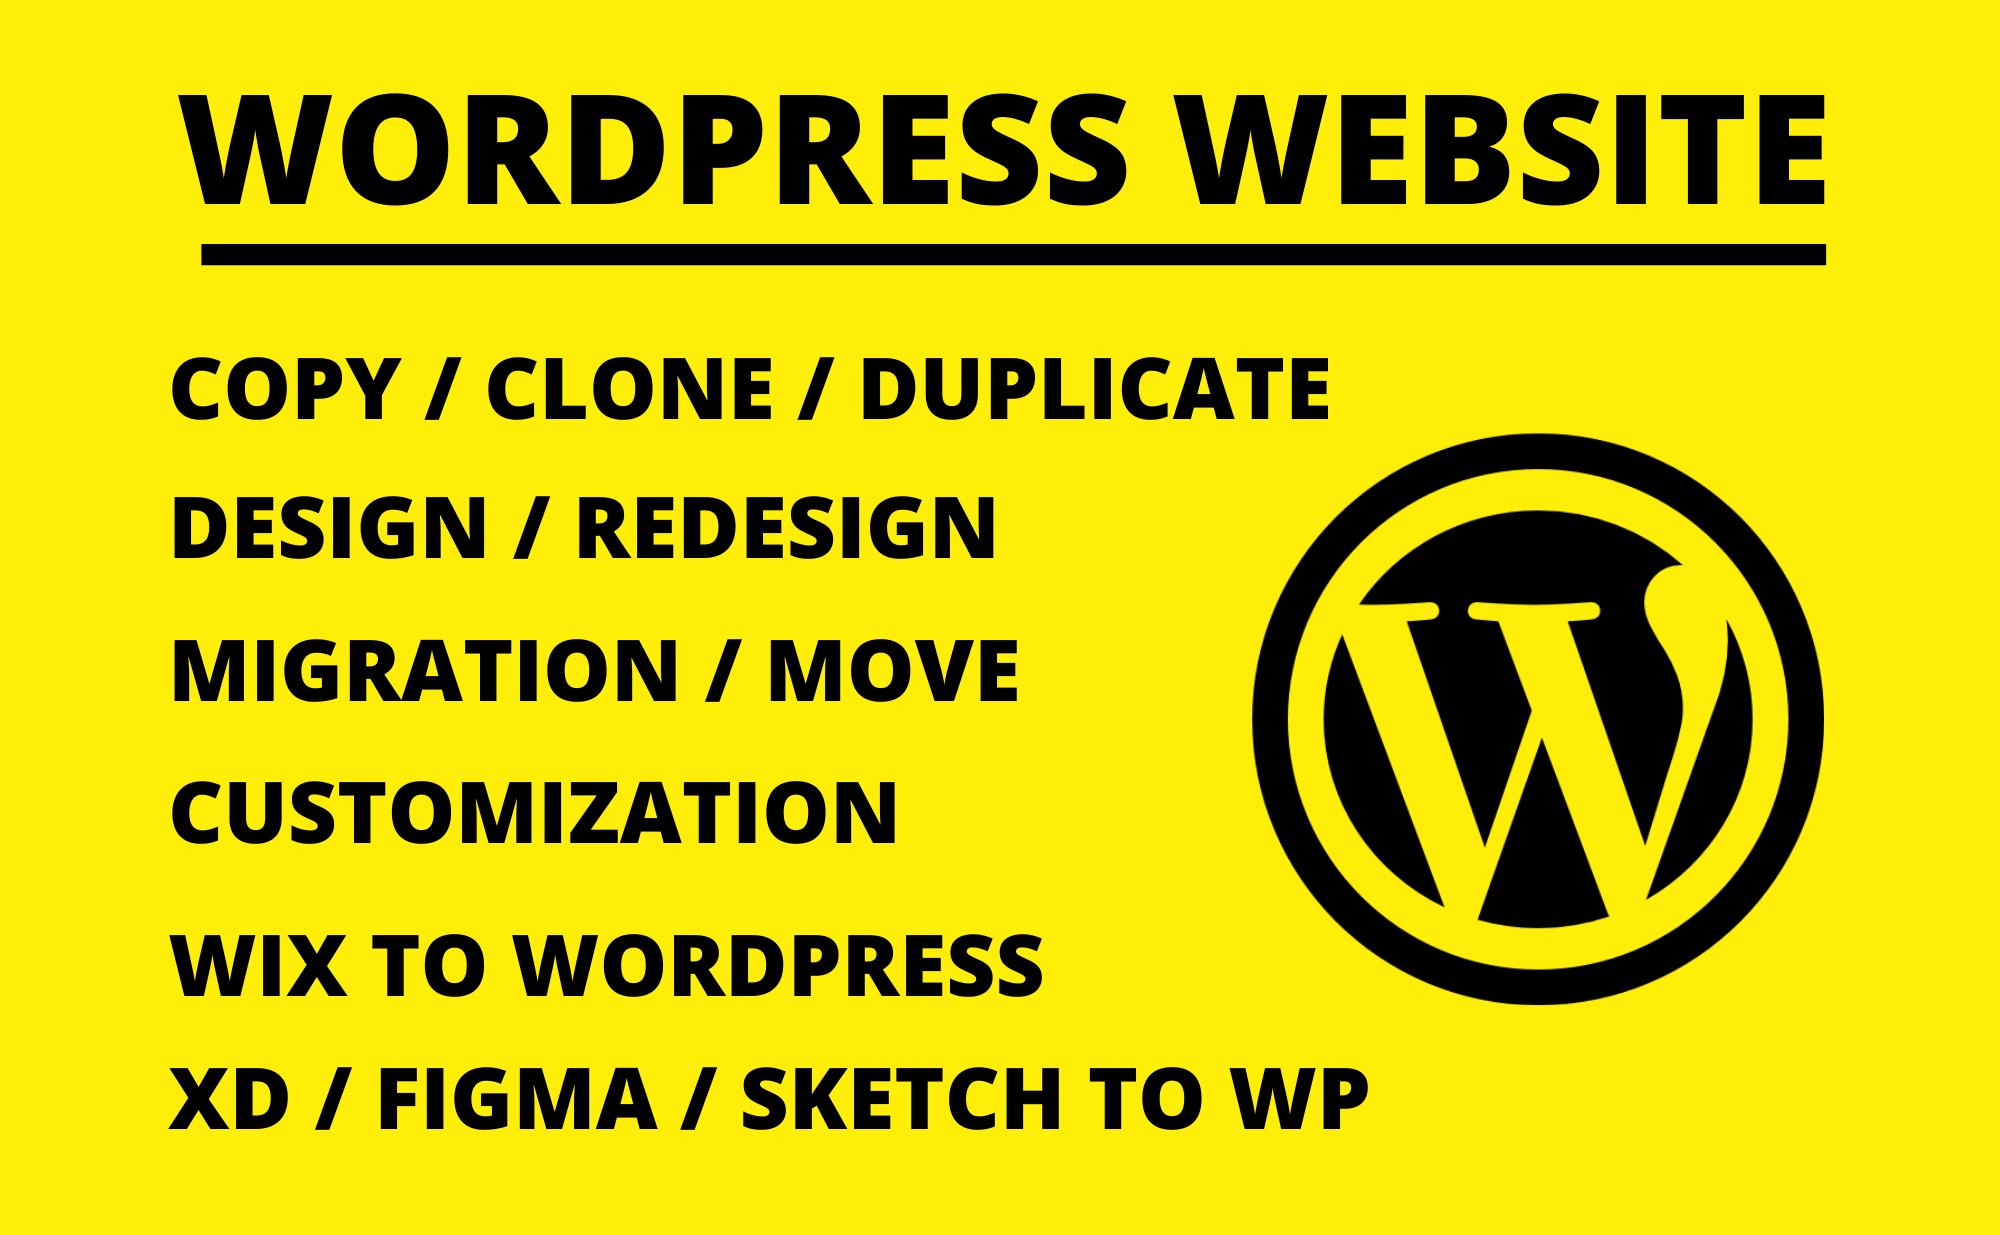 Design,  redesign,  copy / clone,  migration / move,  customize WordPress website,  Wix to WordPress